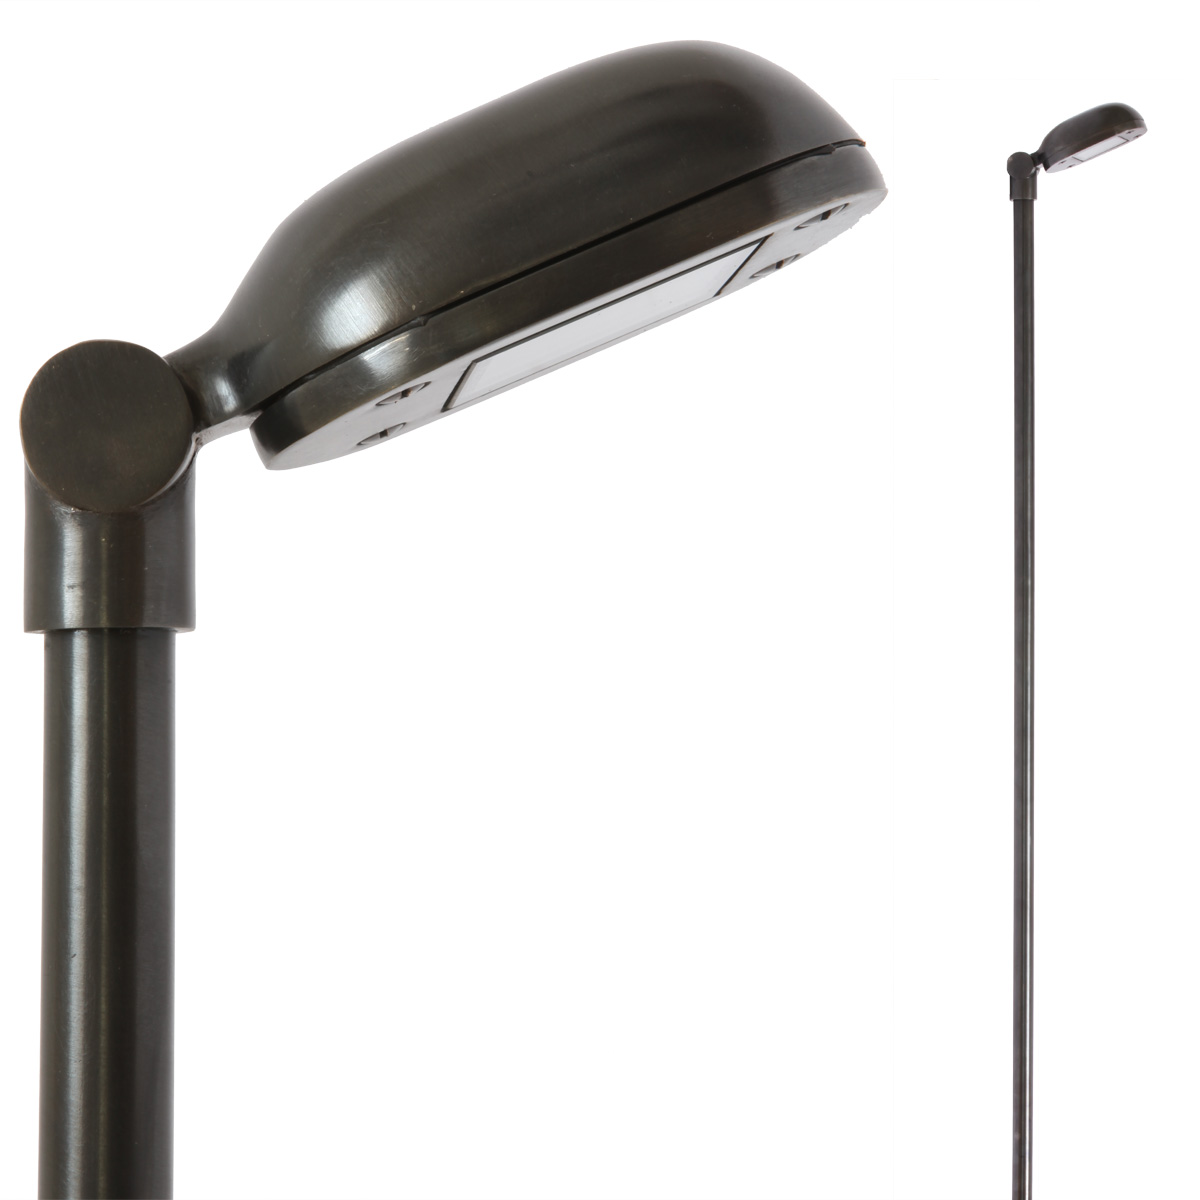 stilvolle wegbeleuchtung aus messing charmond t terra lumi. Black Bedroom Furniture Sets. Home Design Ideas